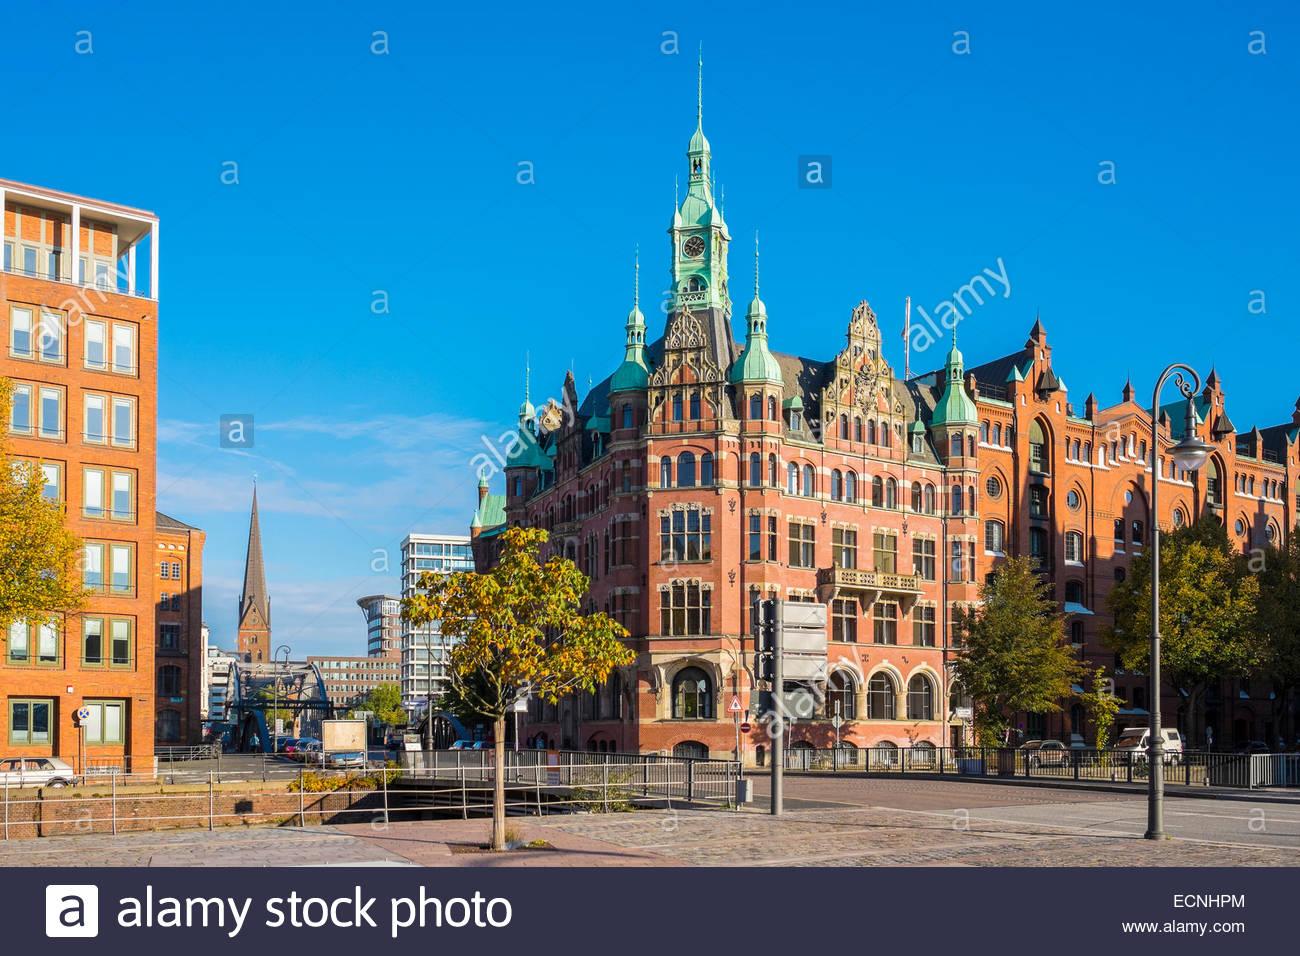 Historic buildings in Speicherstadt warehouse district from St. Annenplatz, Hamburg, Germany - Stock Image